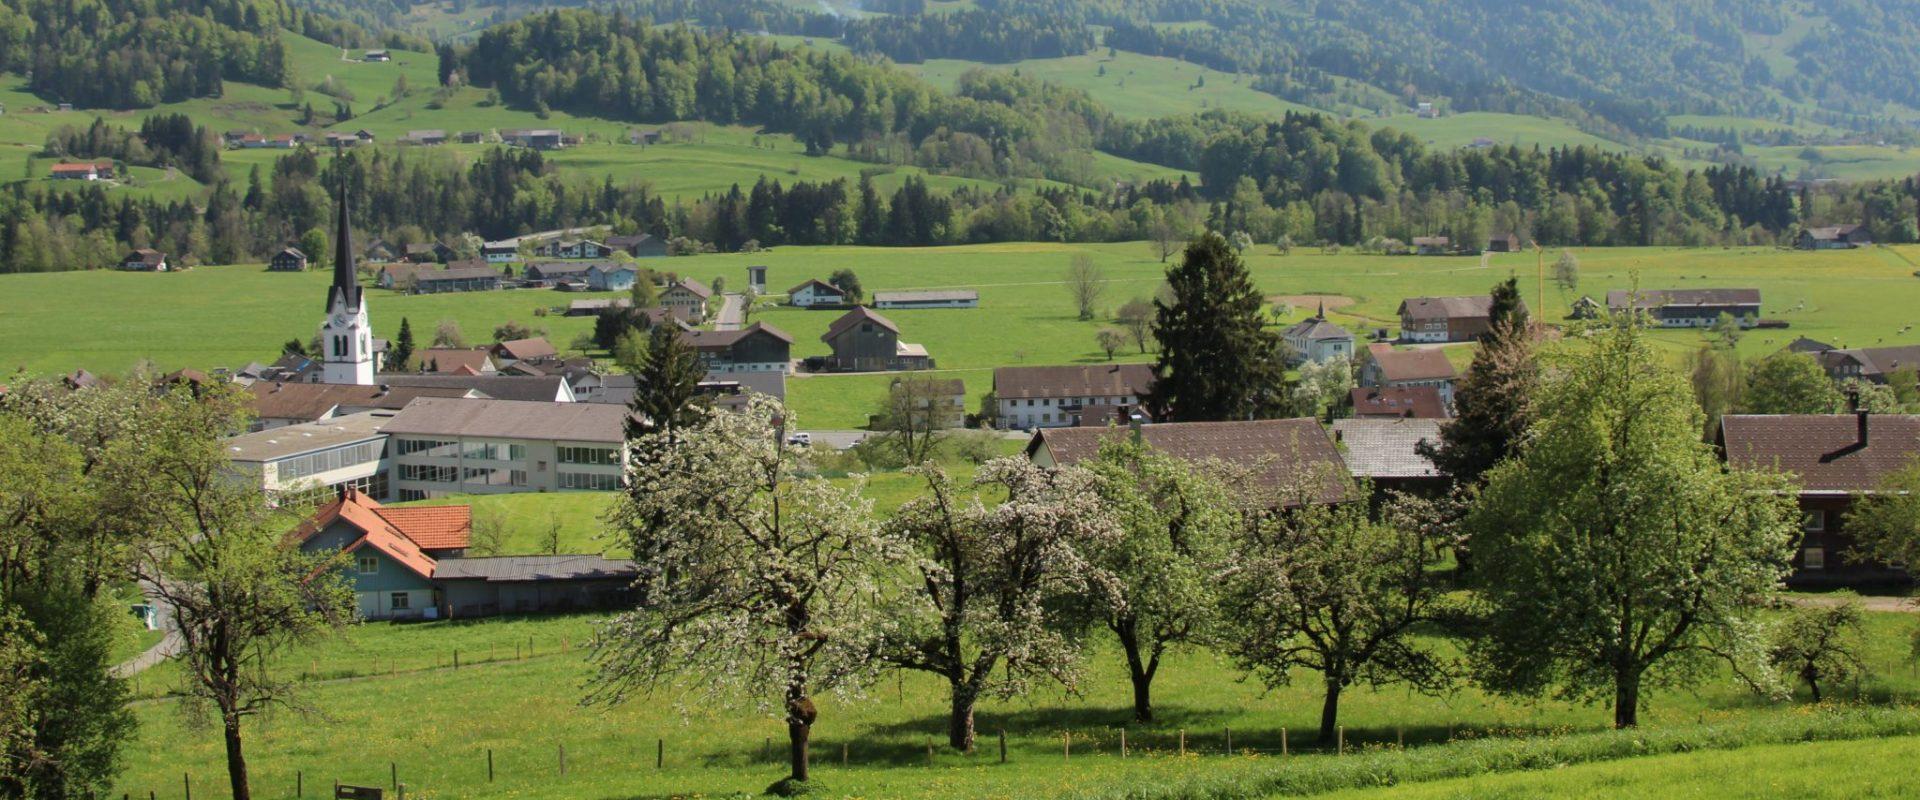 Lingenau Sommer_Tanja Steurer_Lingenau Tourismus